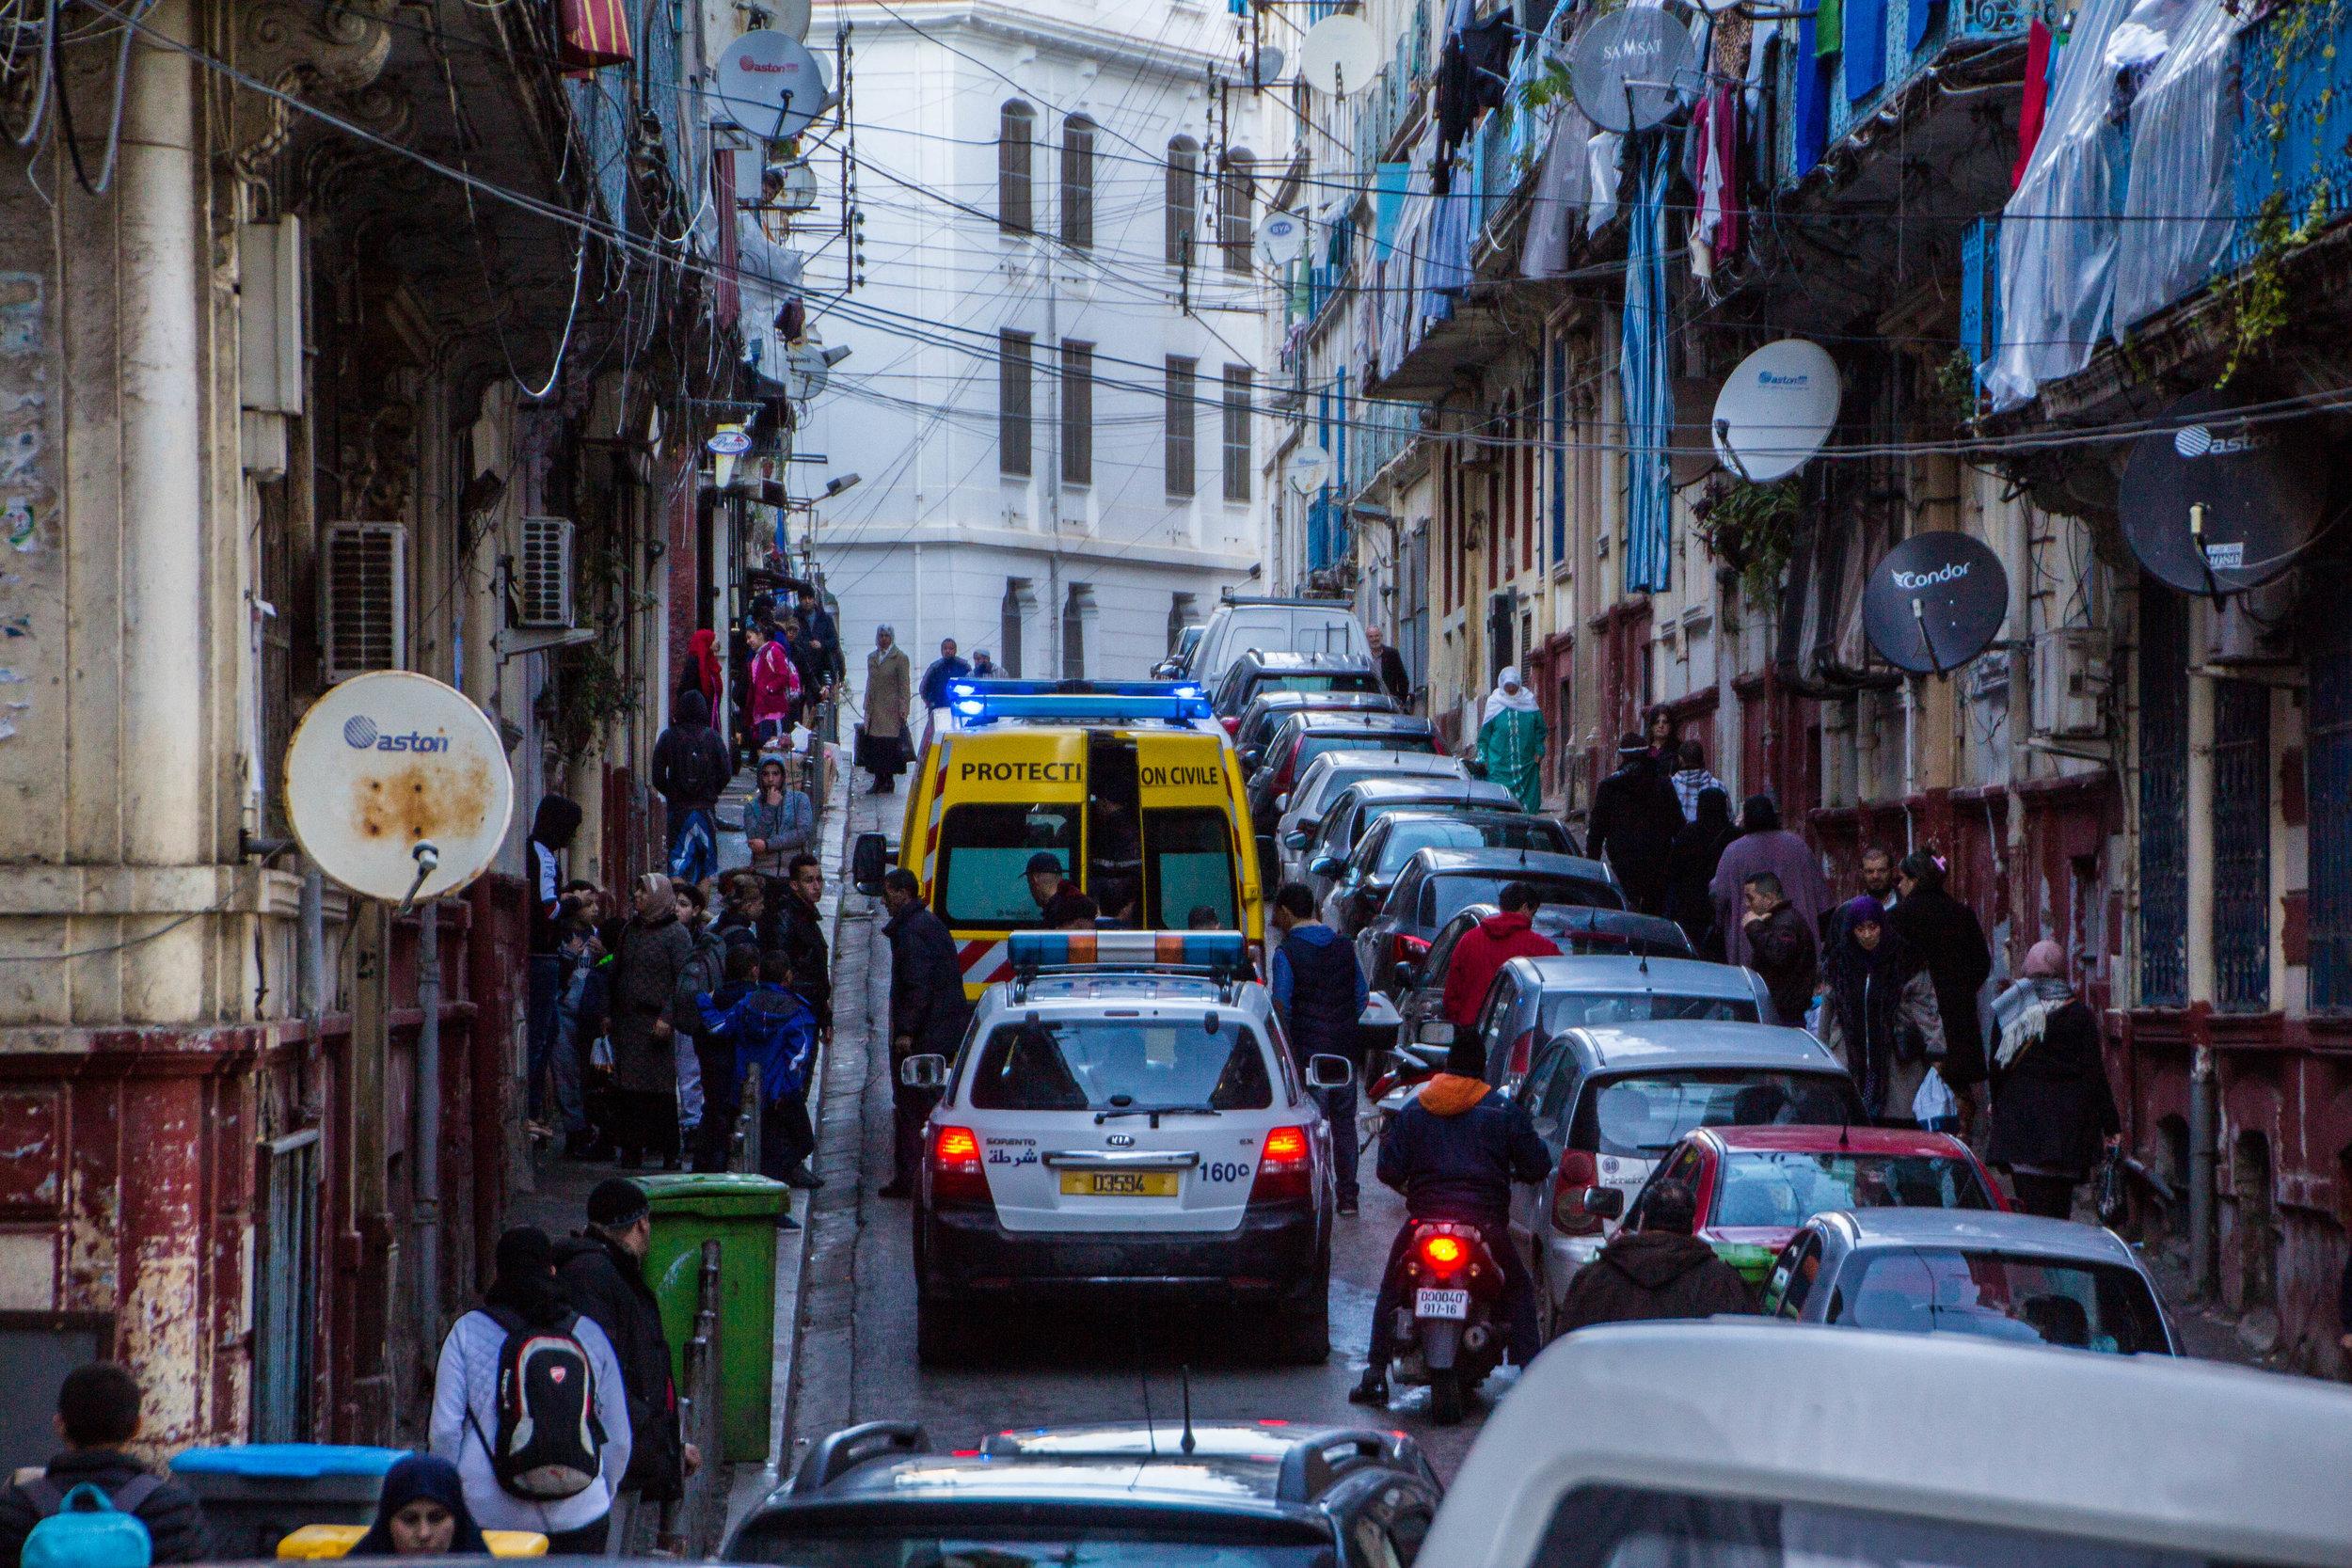 streets-algiers-algeria-19-2.jpg